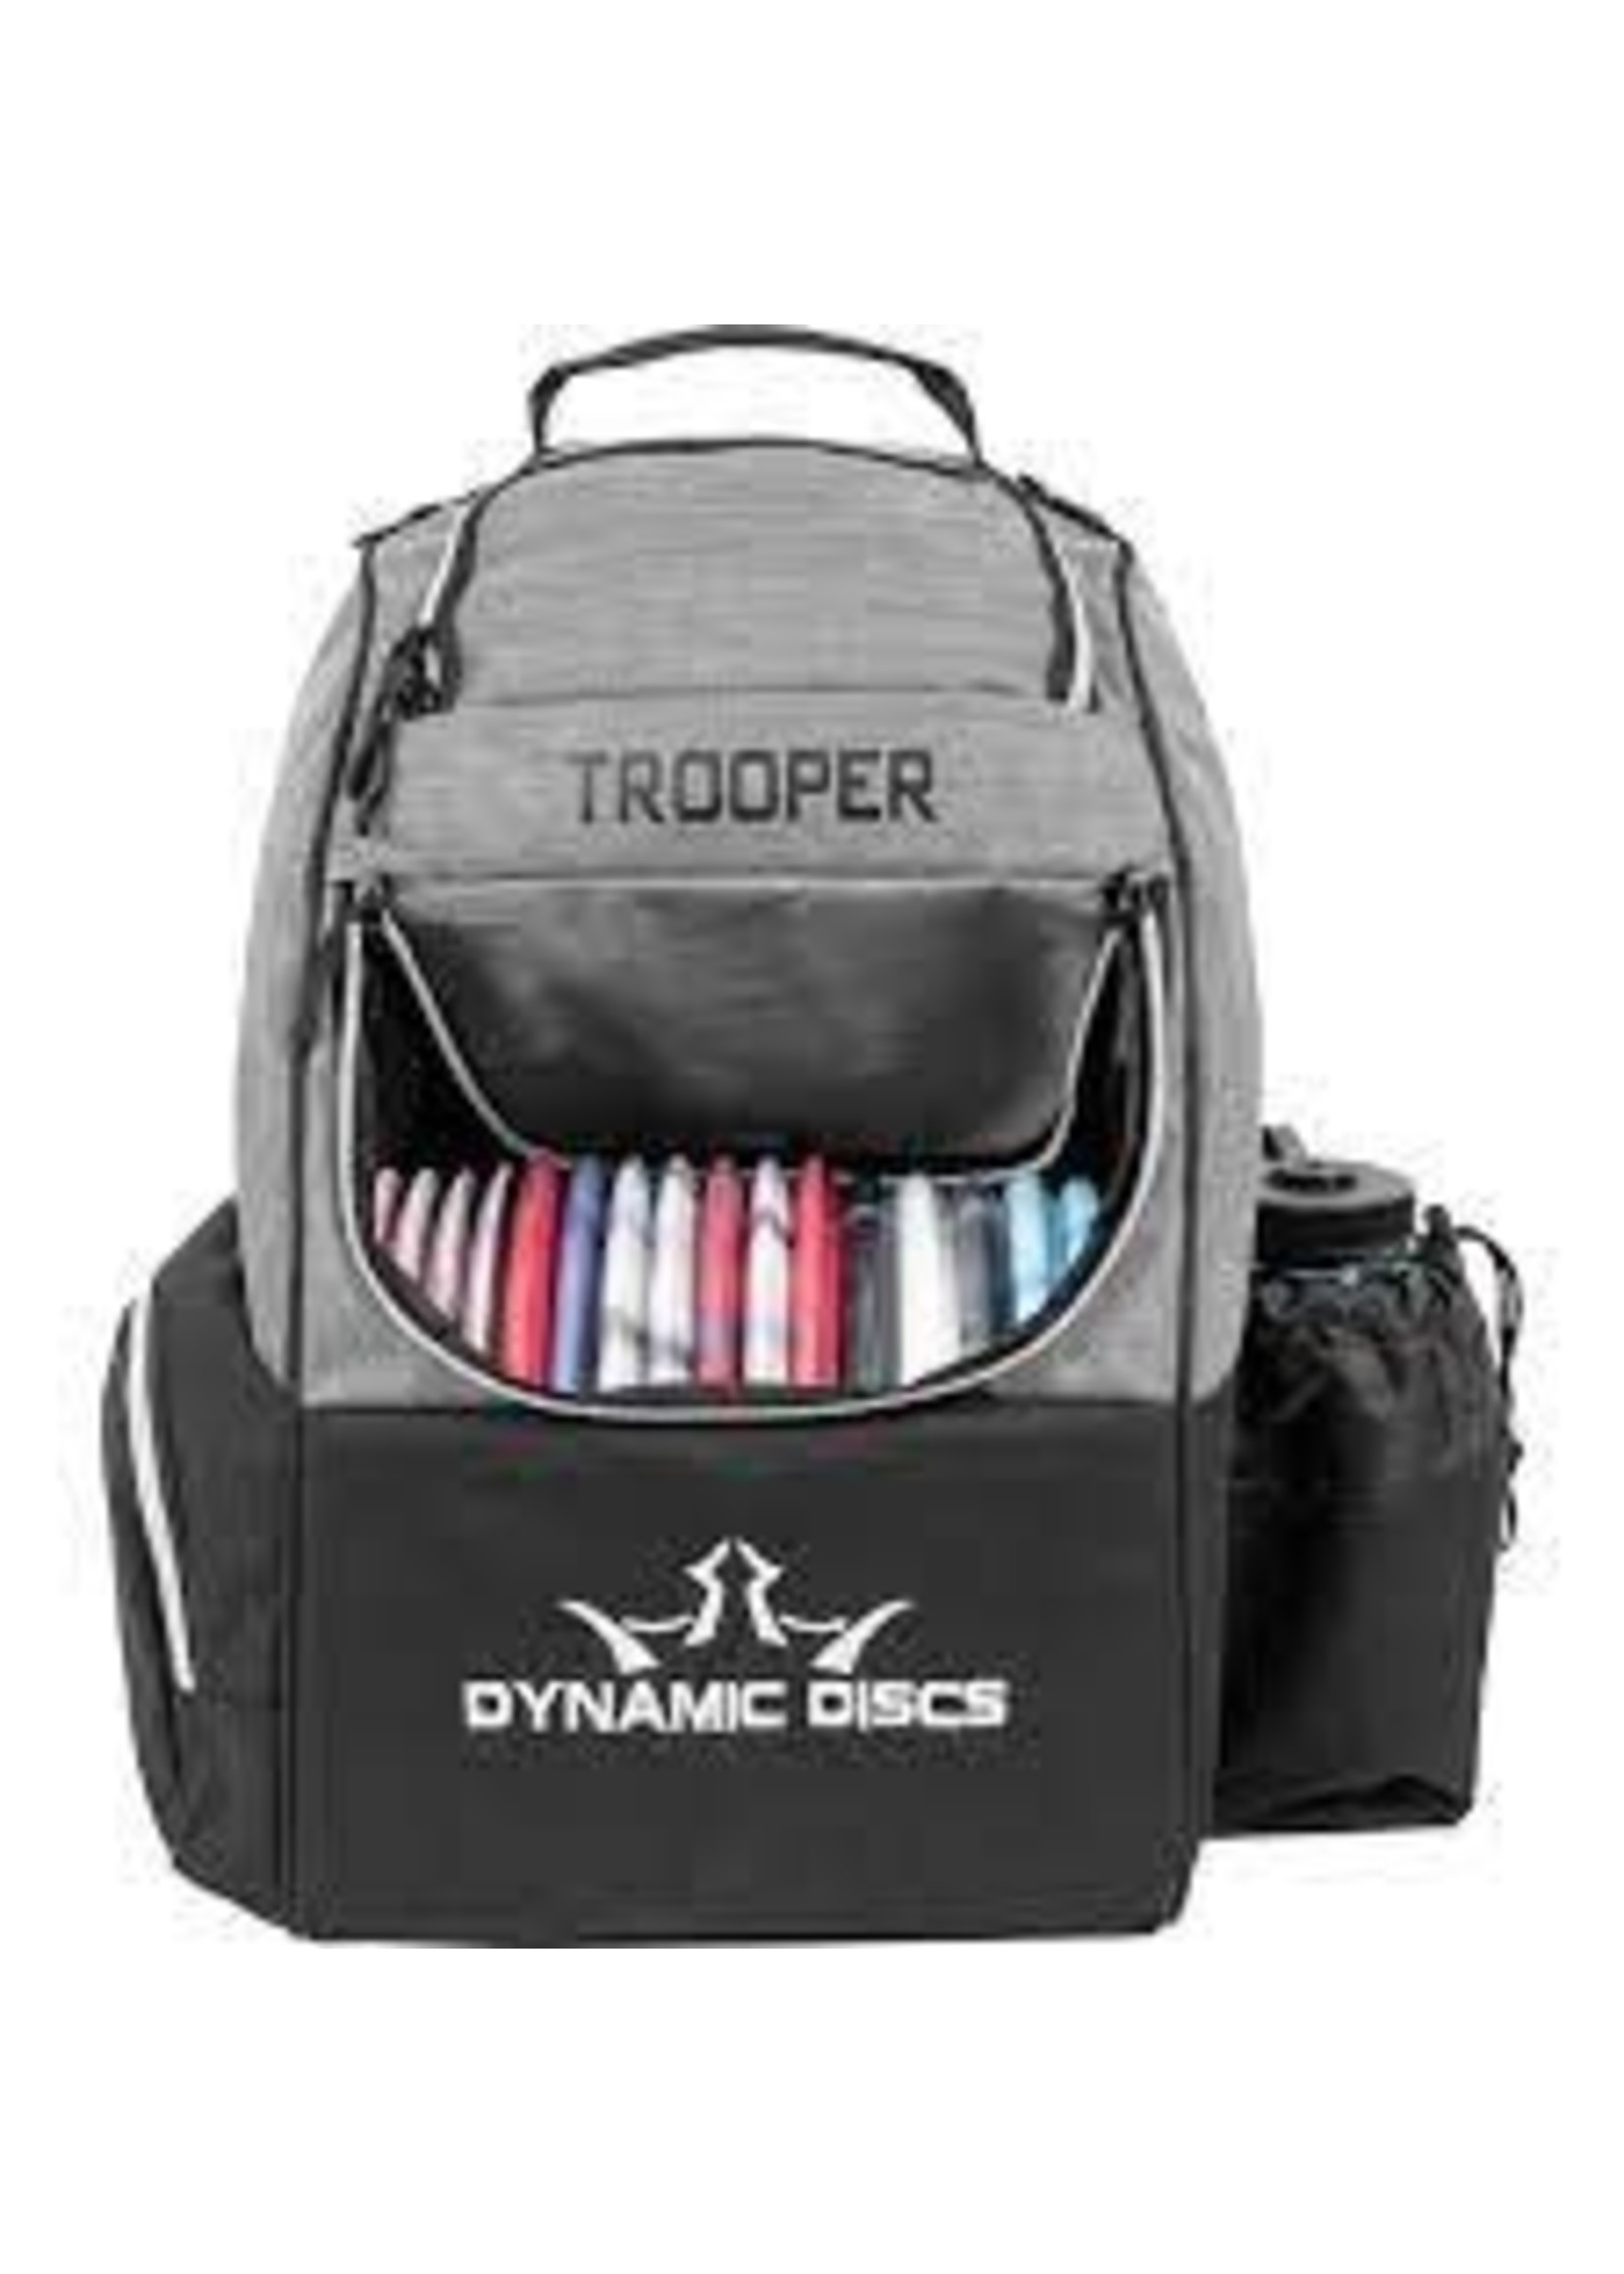 Dynamic Discs Dynamic Discs Trooper Backpack